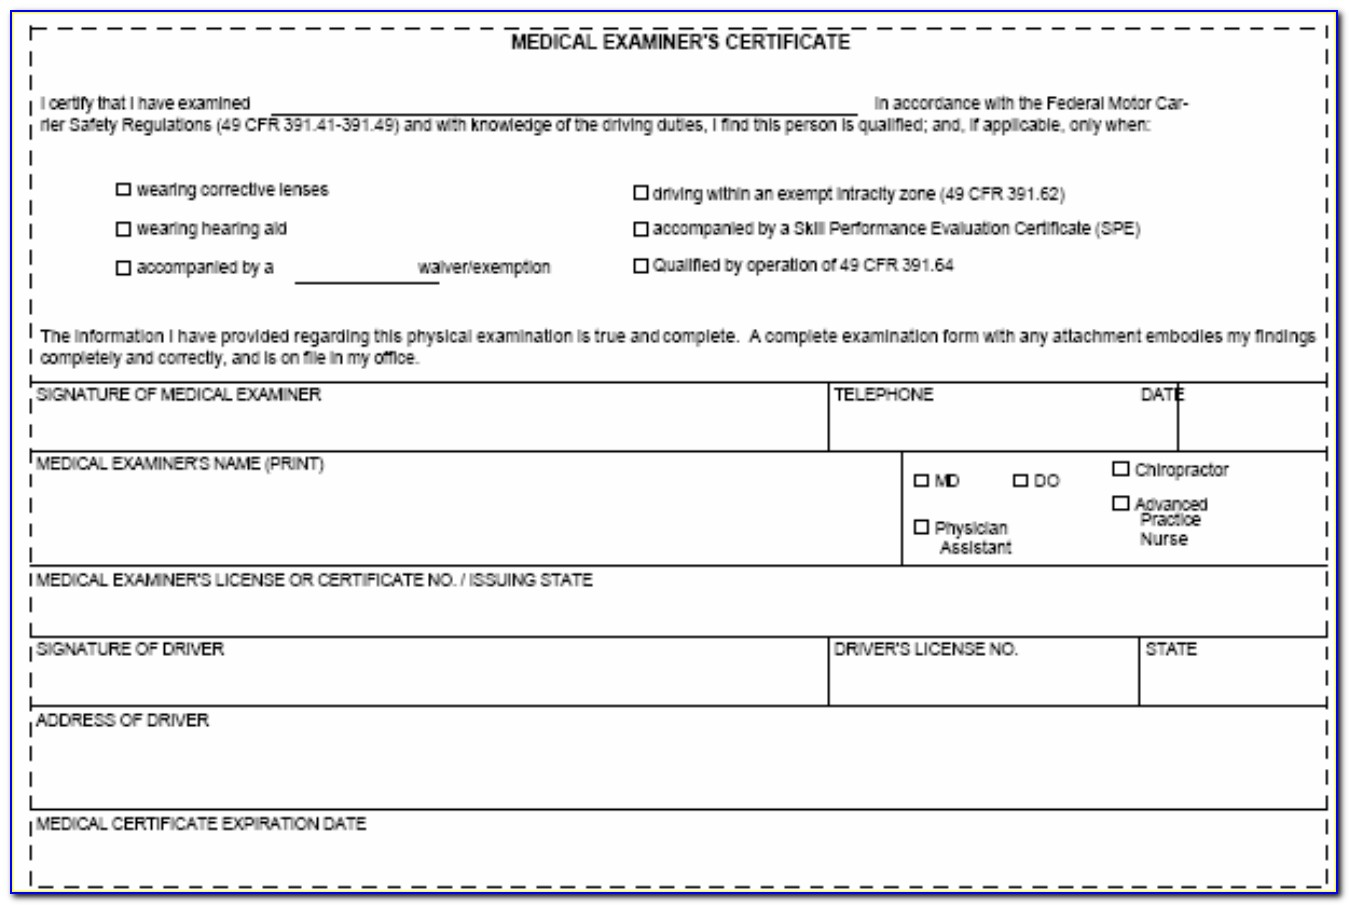 Medical Examiners Certificate Pdf